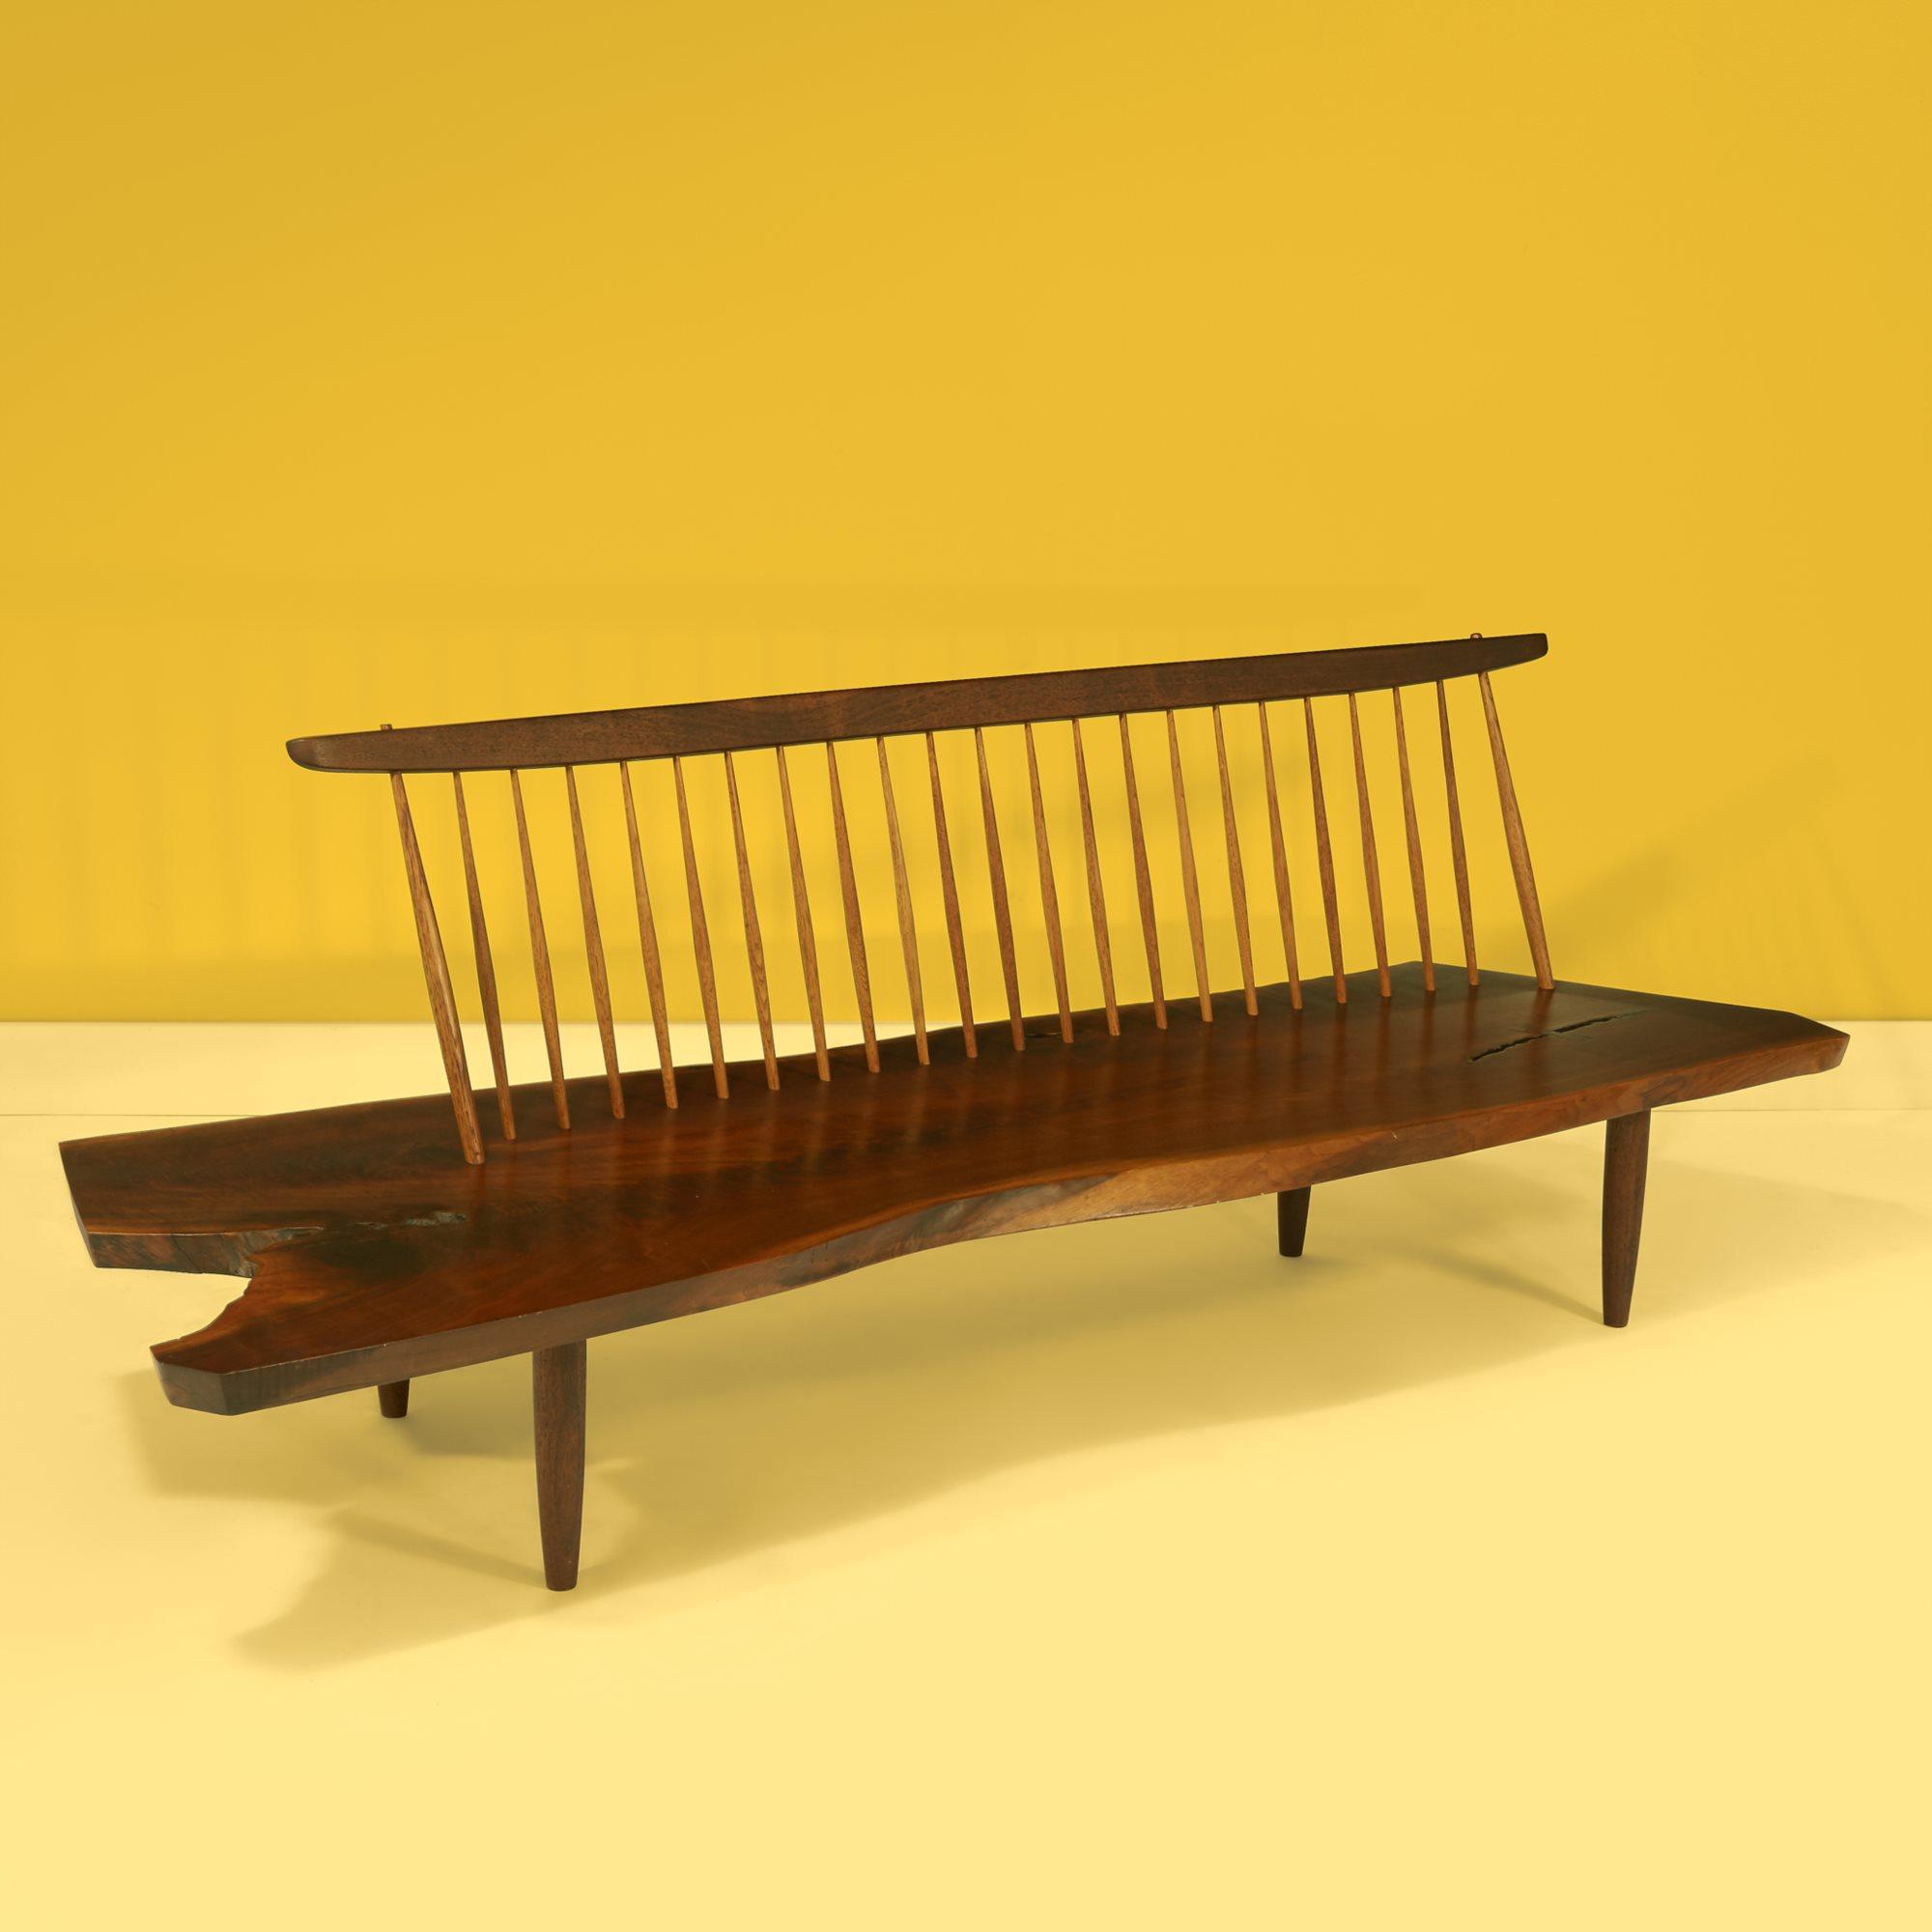 Lot 28  |  Fine Conoid Bench, New Hope, Pennsylvania, 1974, $30,000-50,000